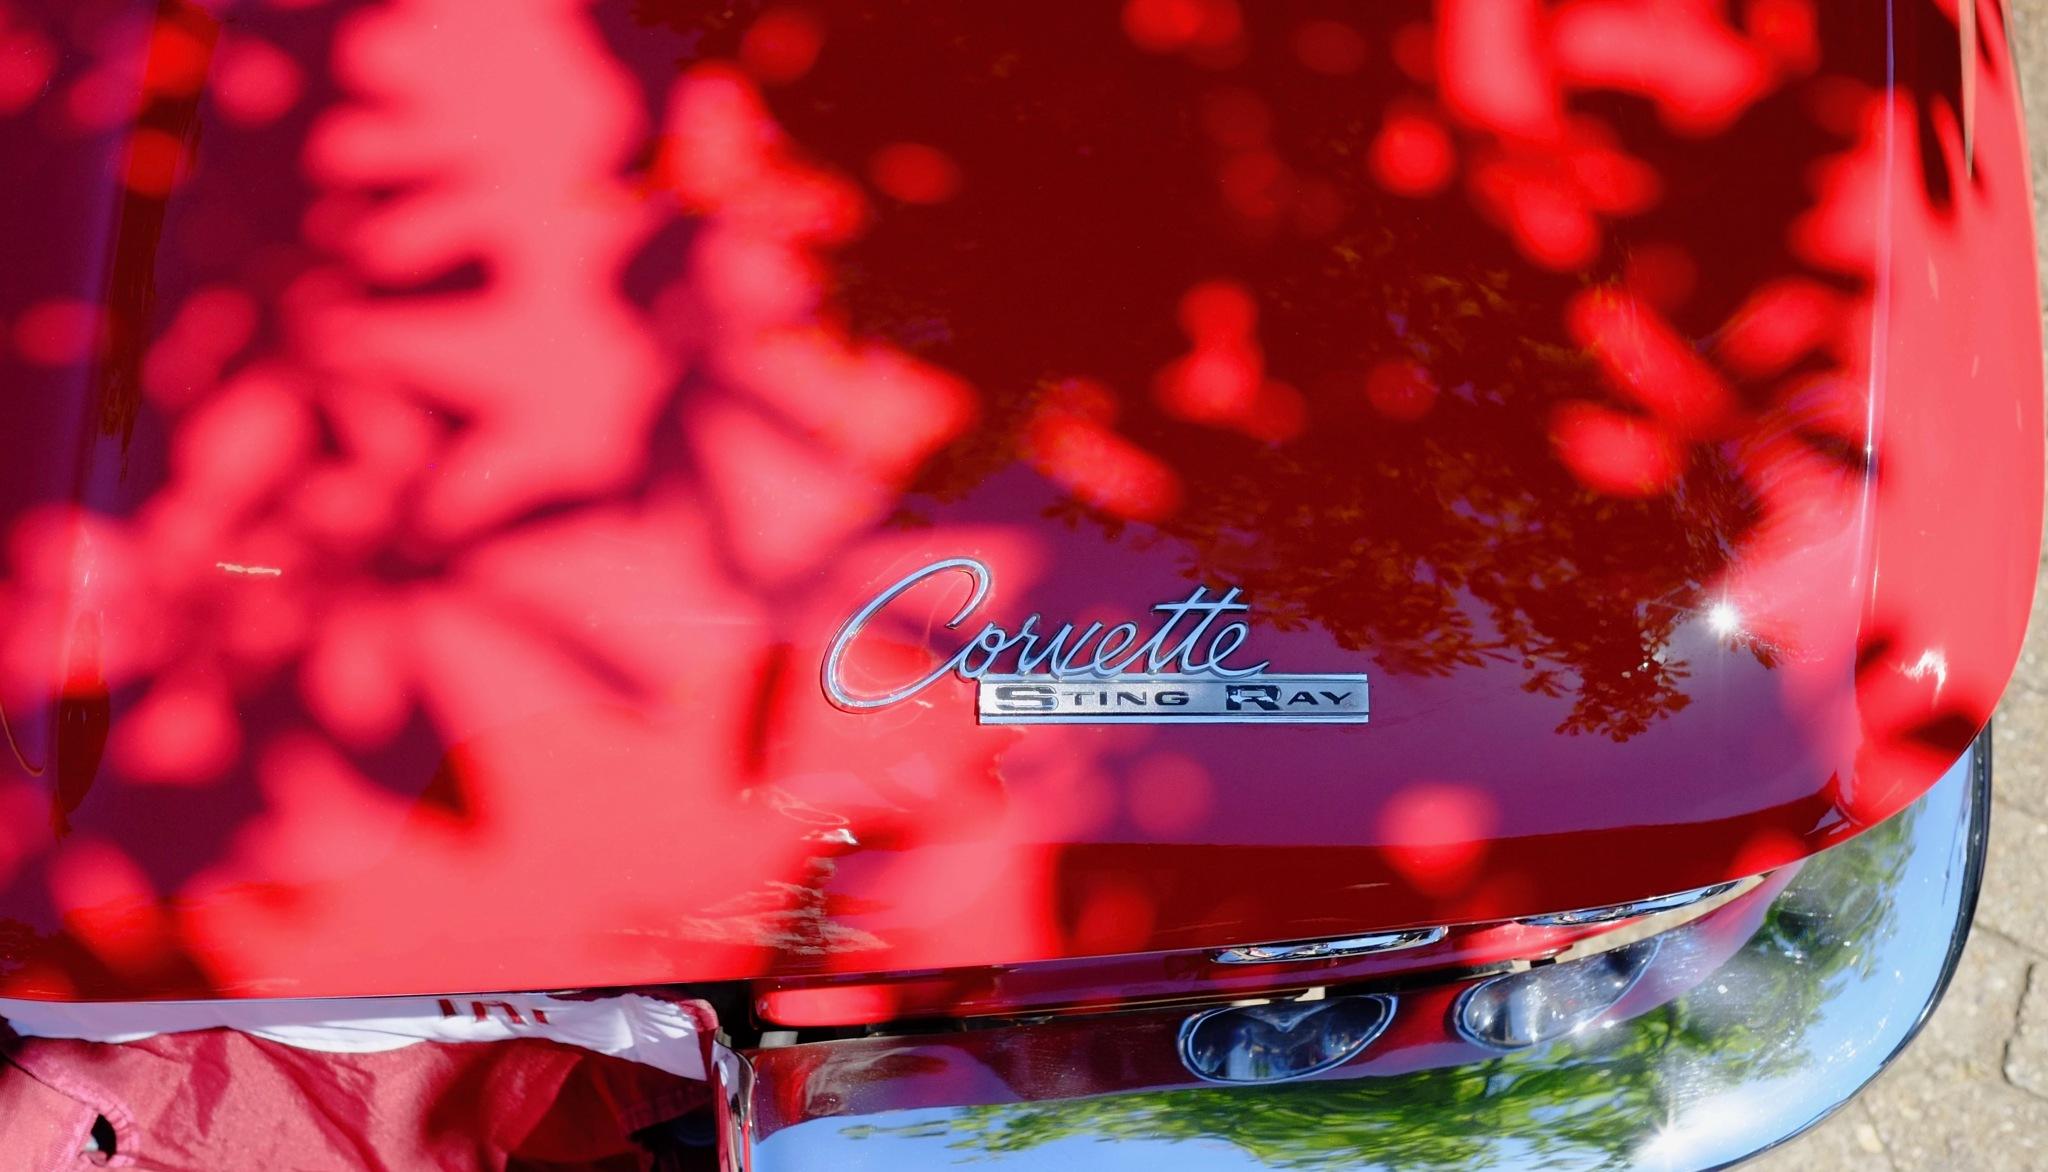 Little Red Corvette by peterkryzun